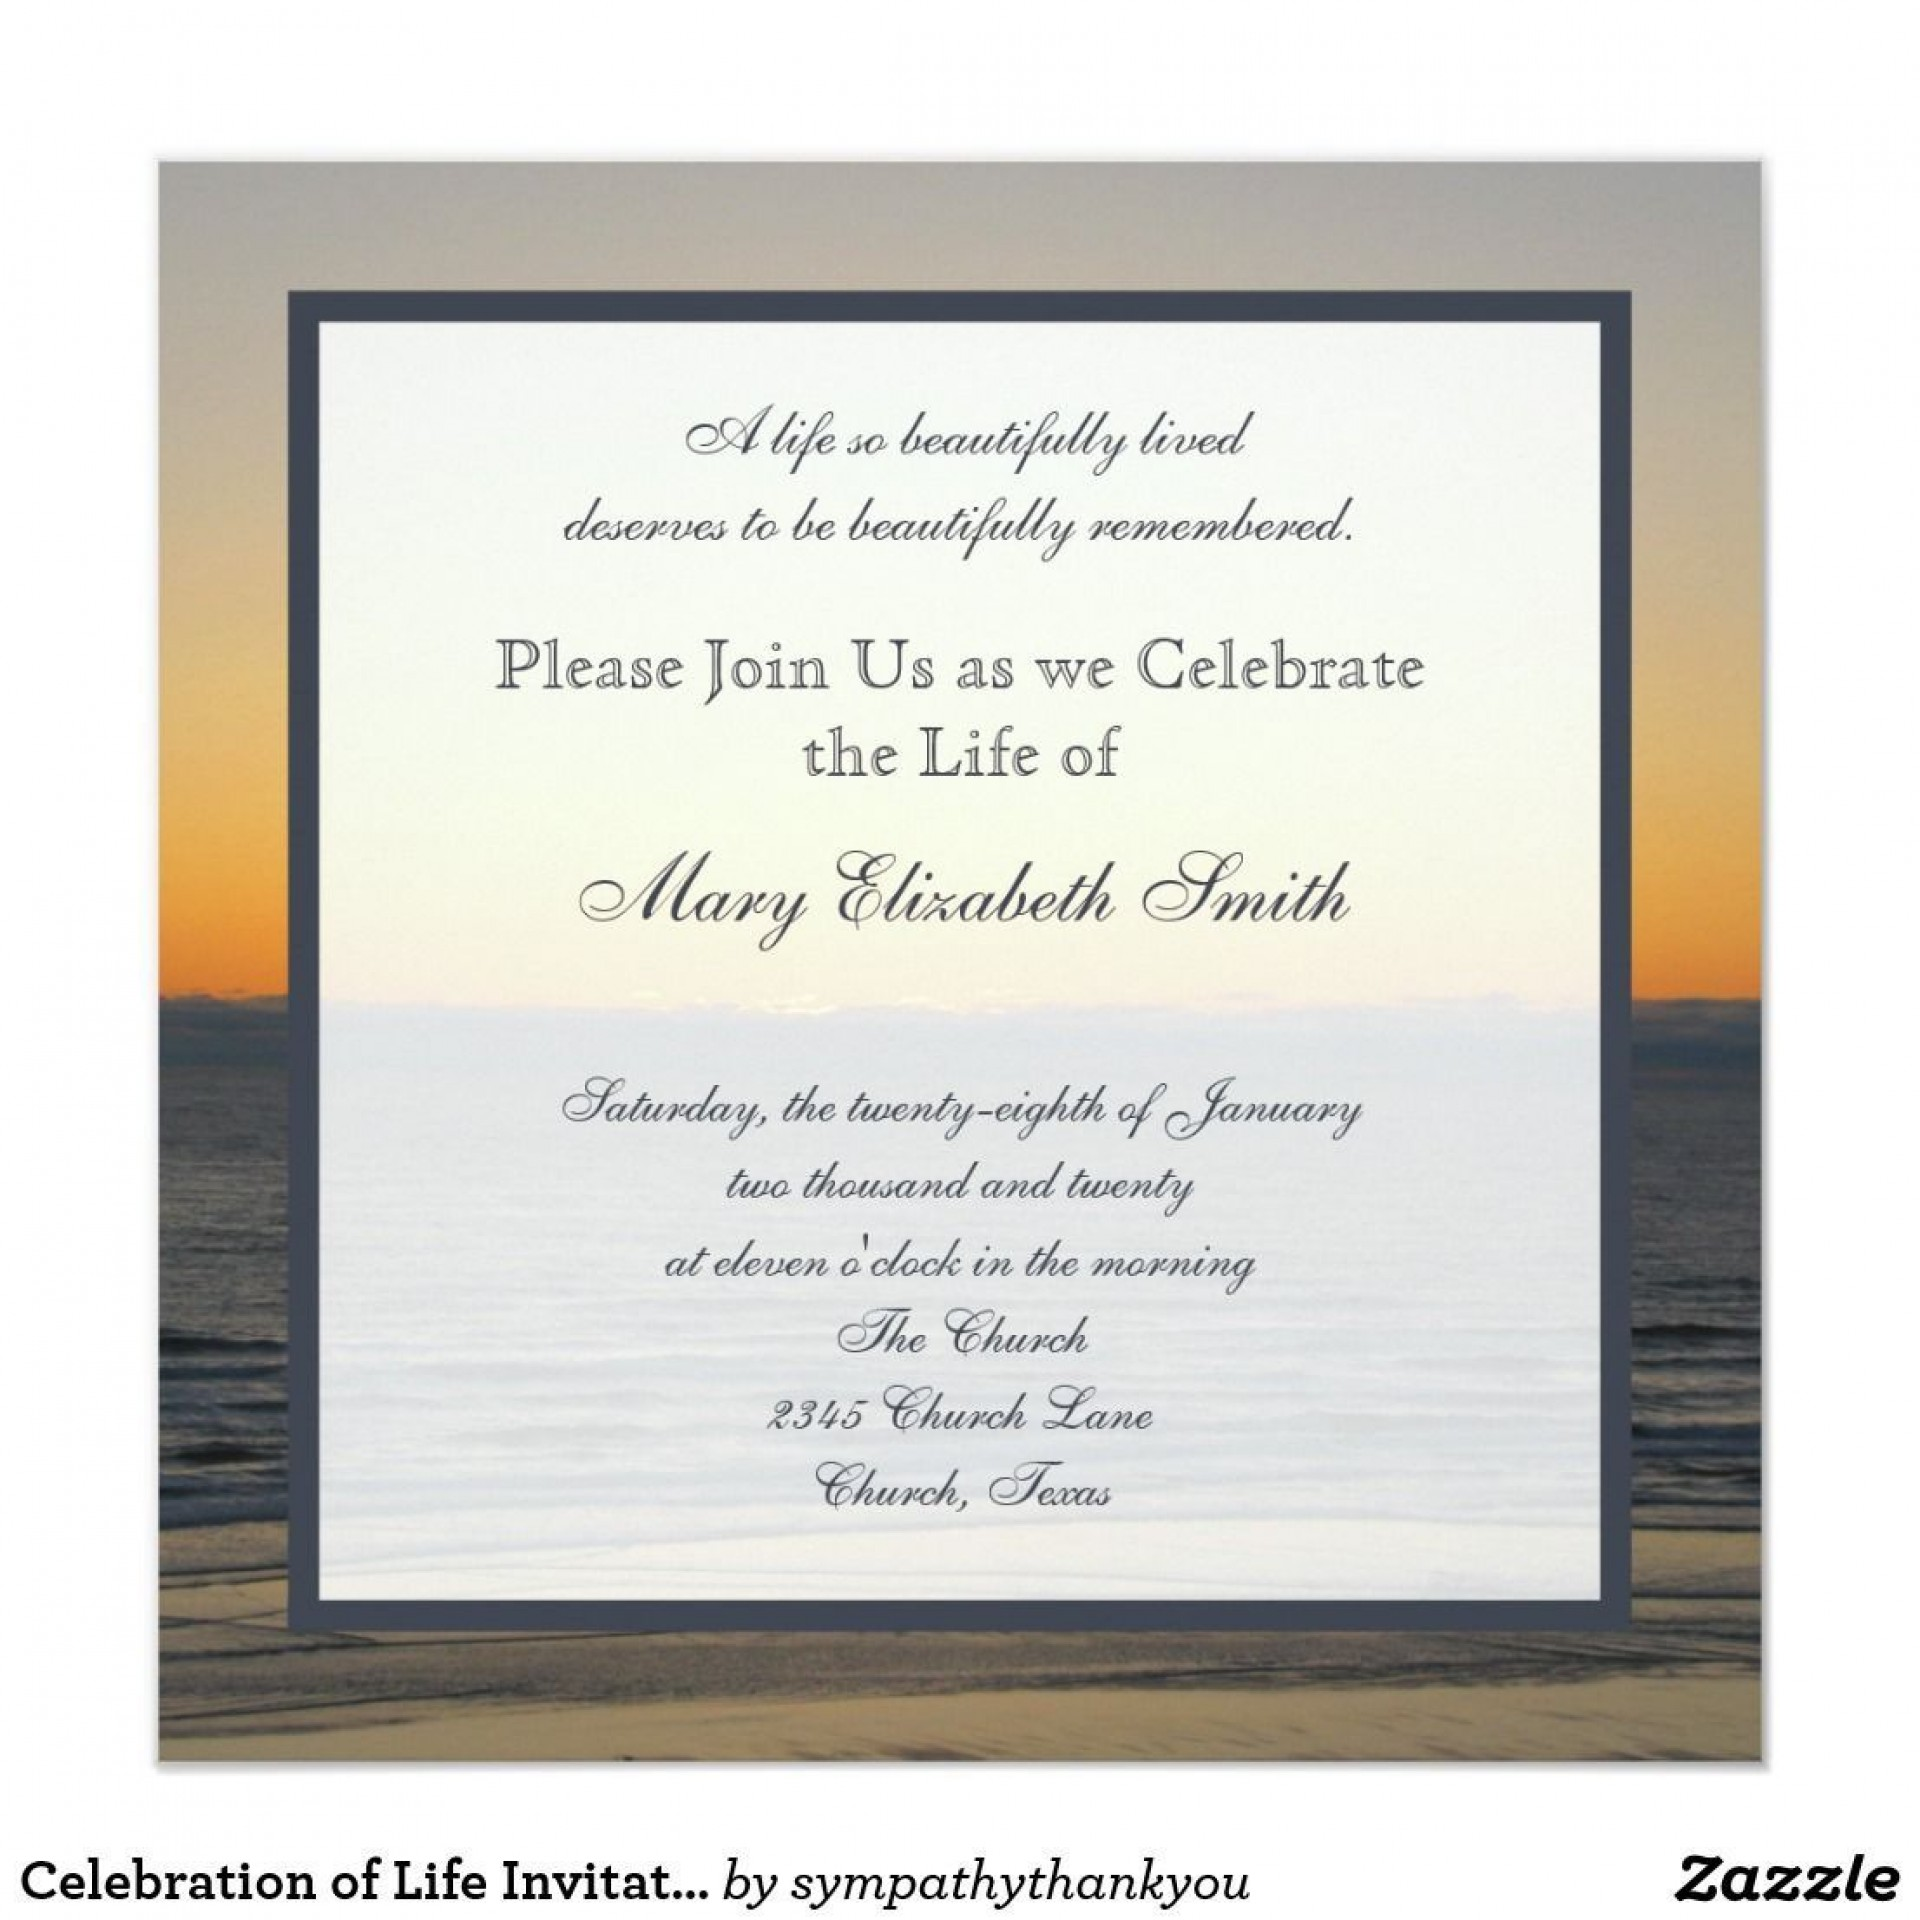 004 Fearsome Celebration Of Life Announcement Template Free Example  Invitation Download Invite1920